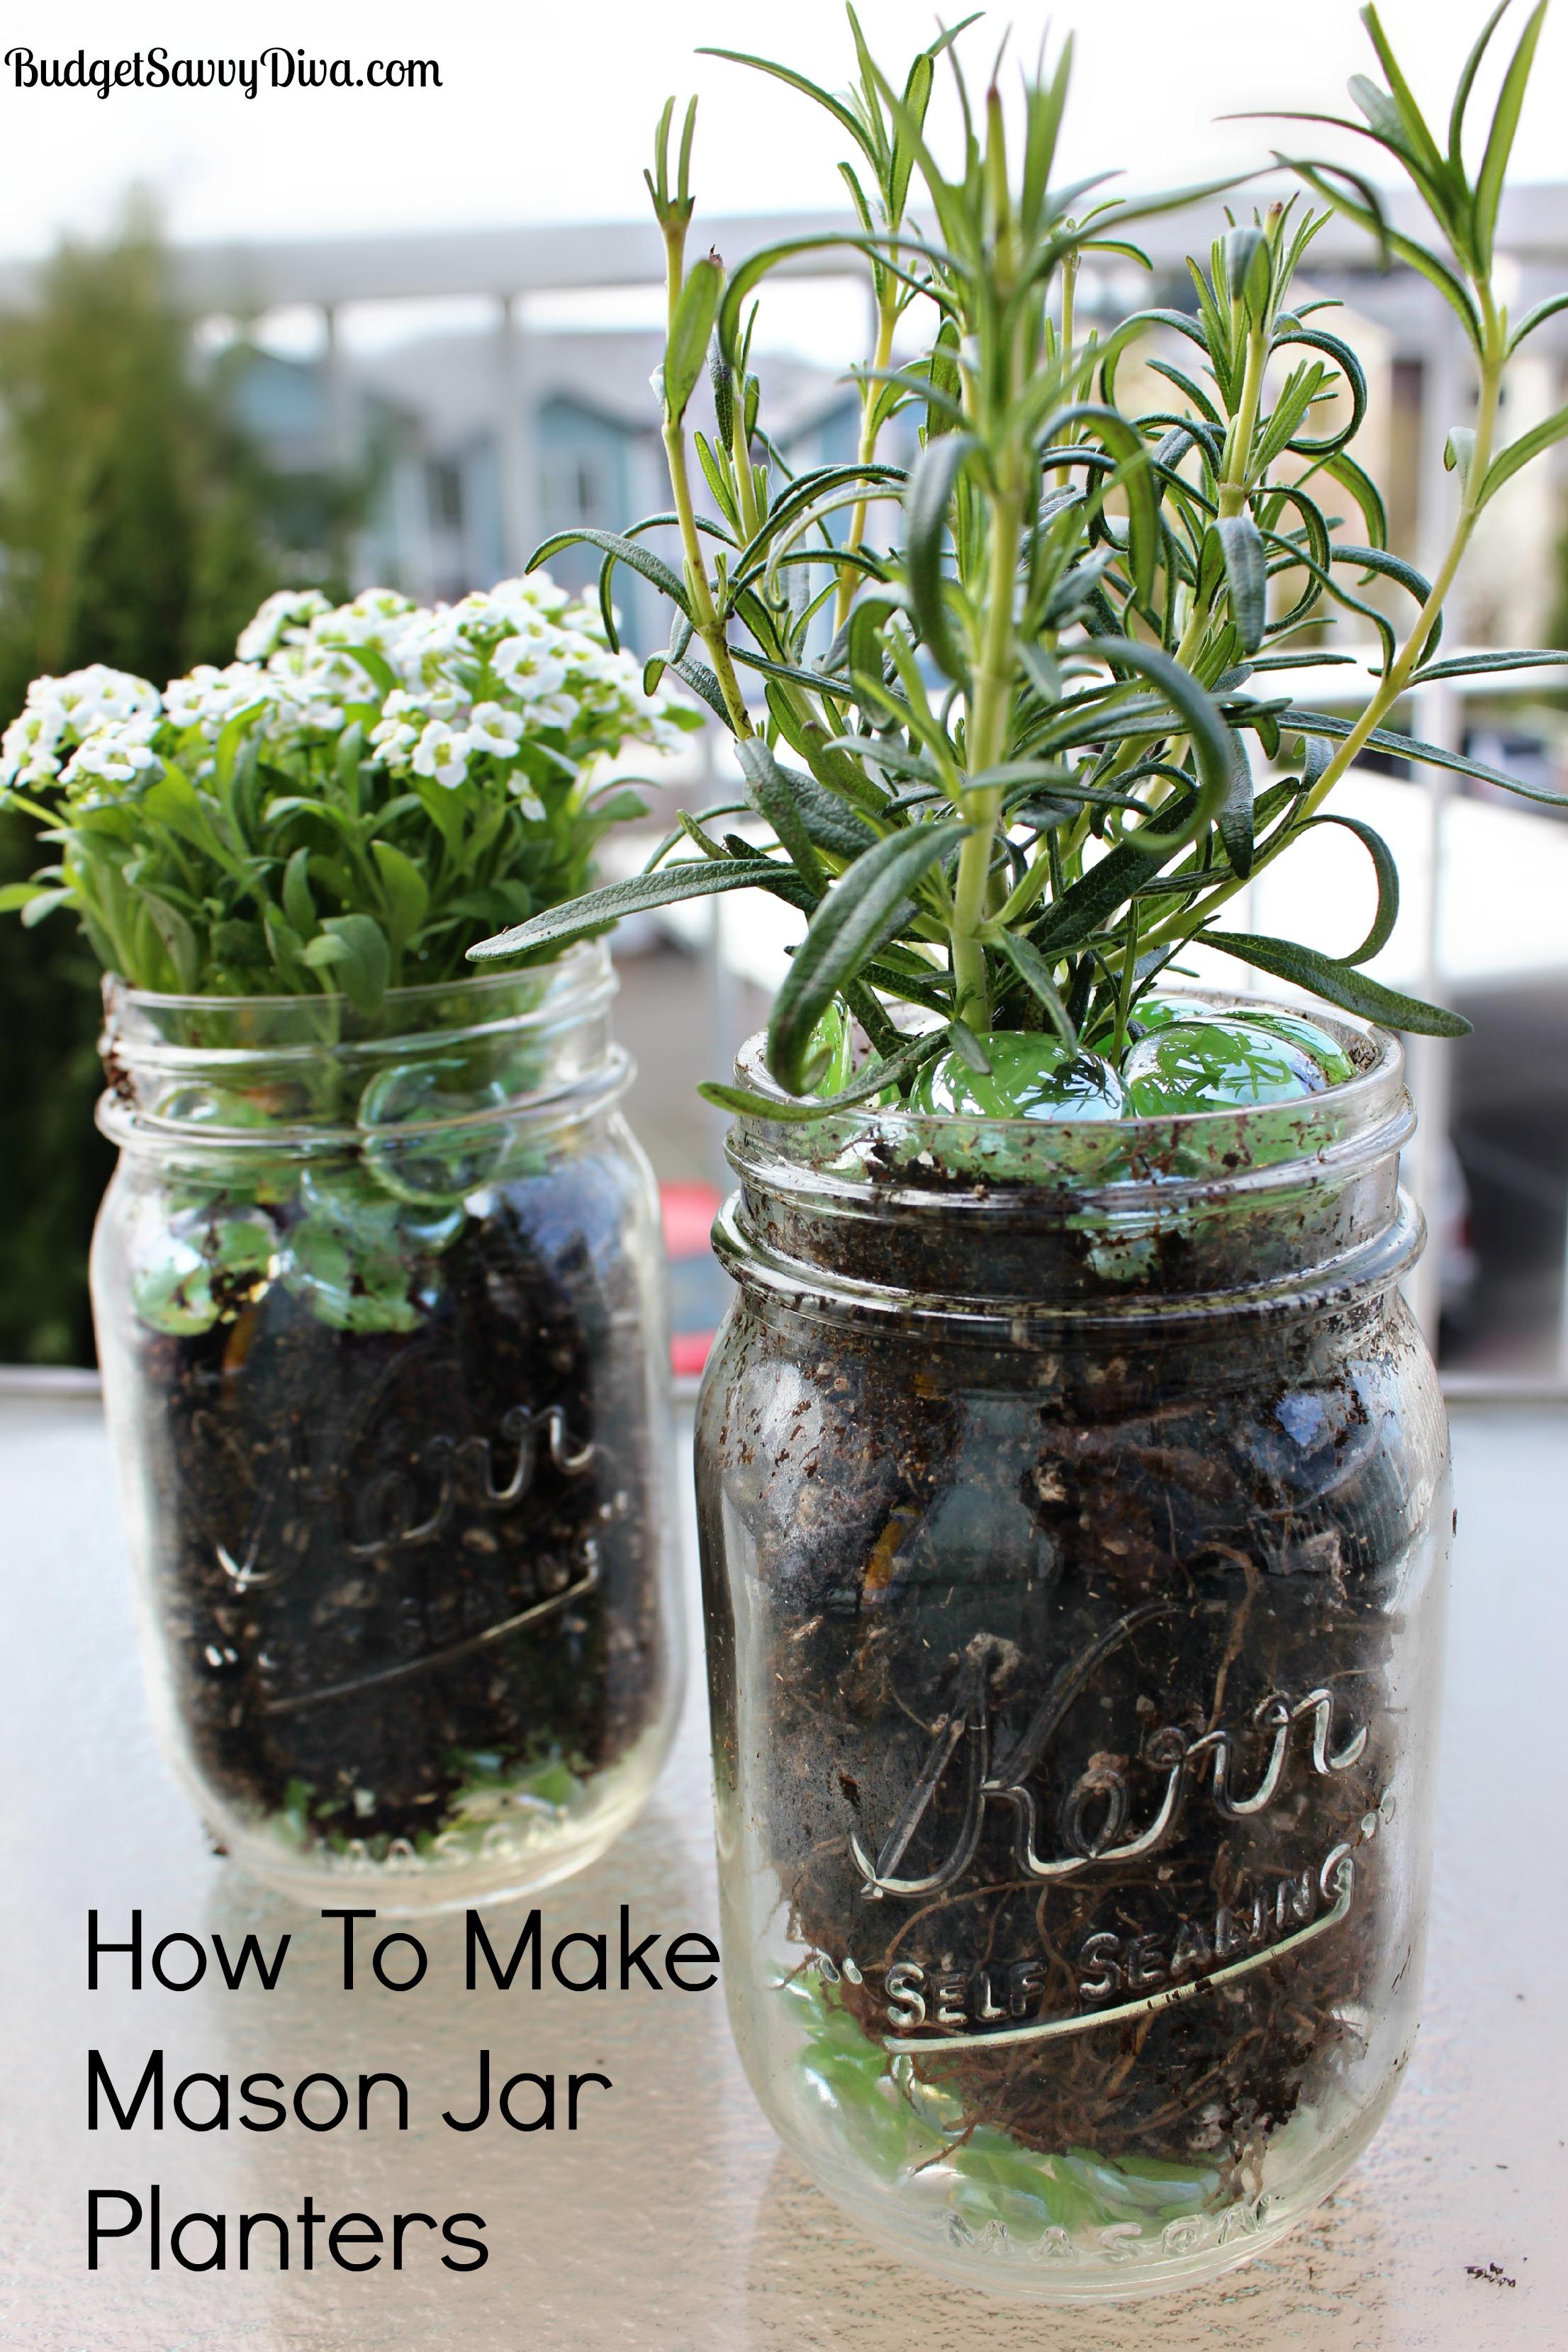 How To Make Mason Jar Planters Budget Savvy Diva